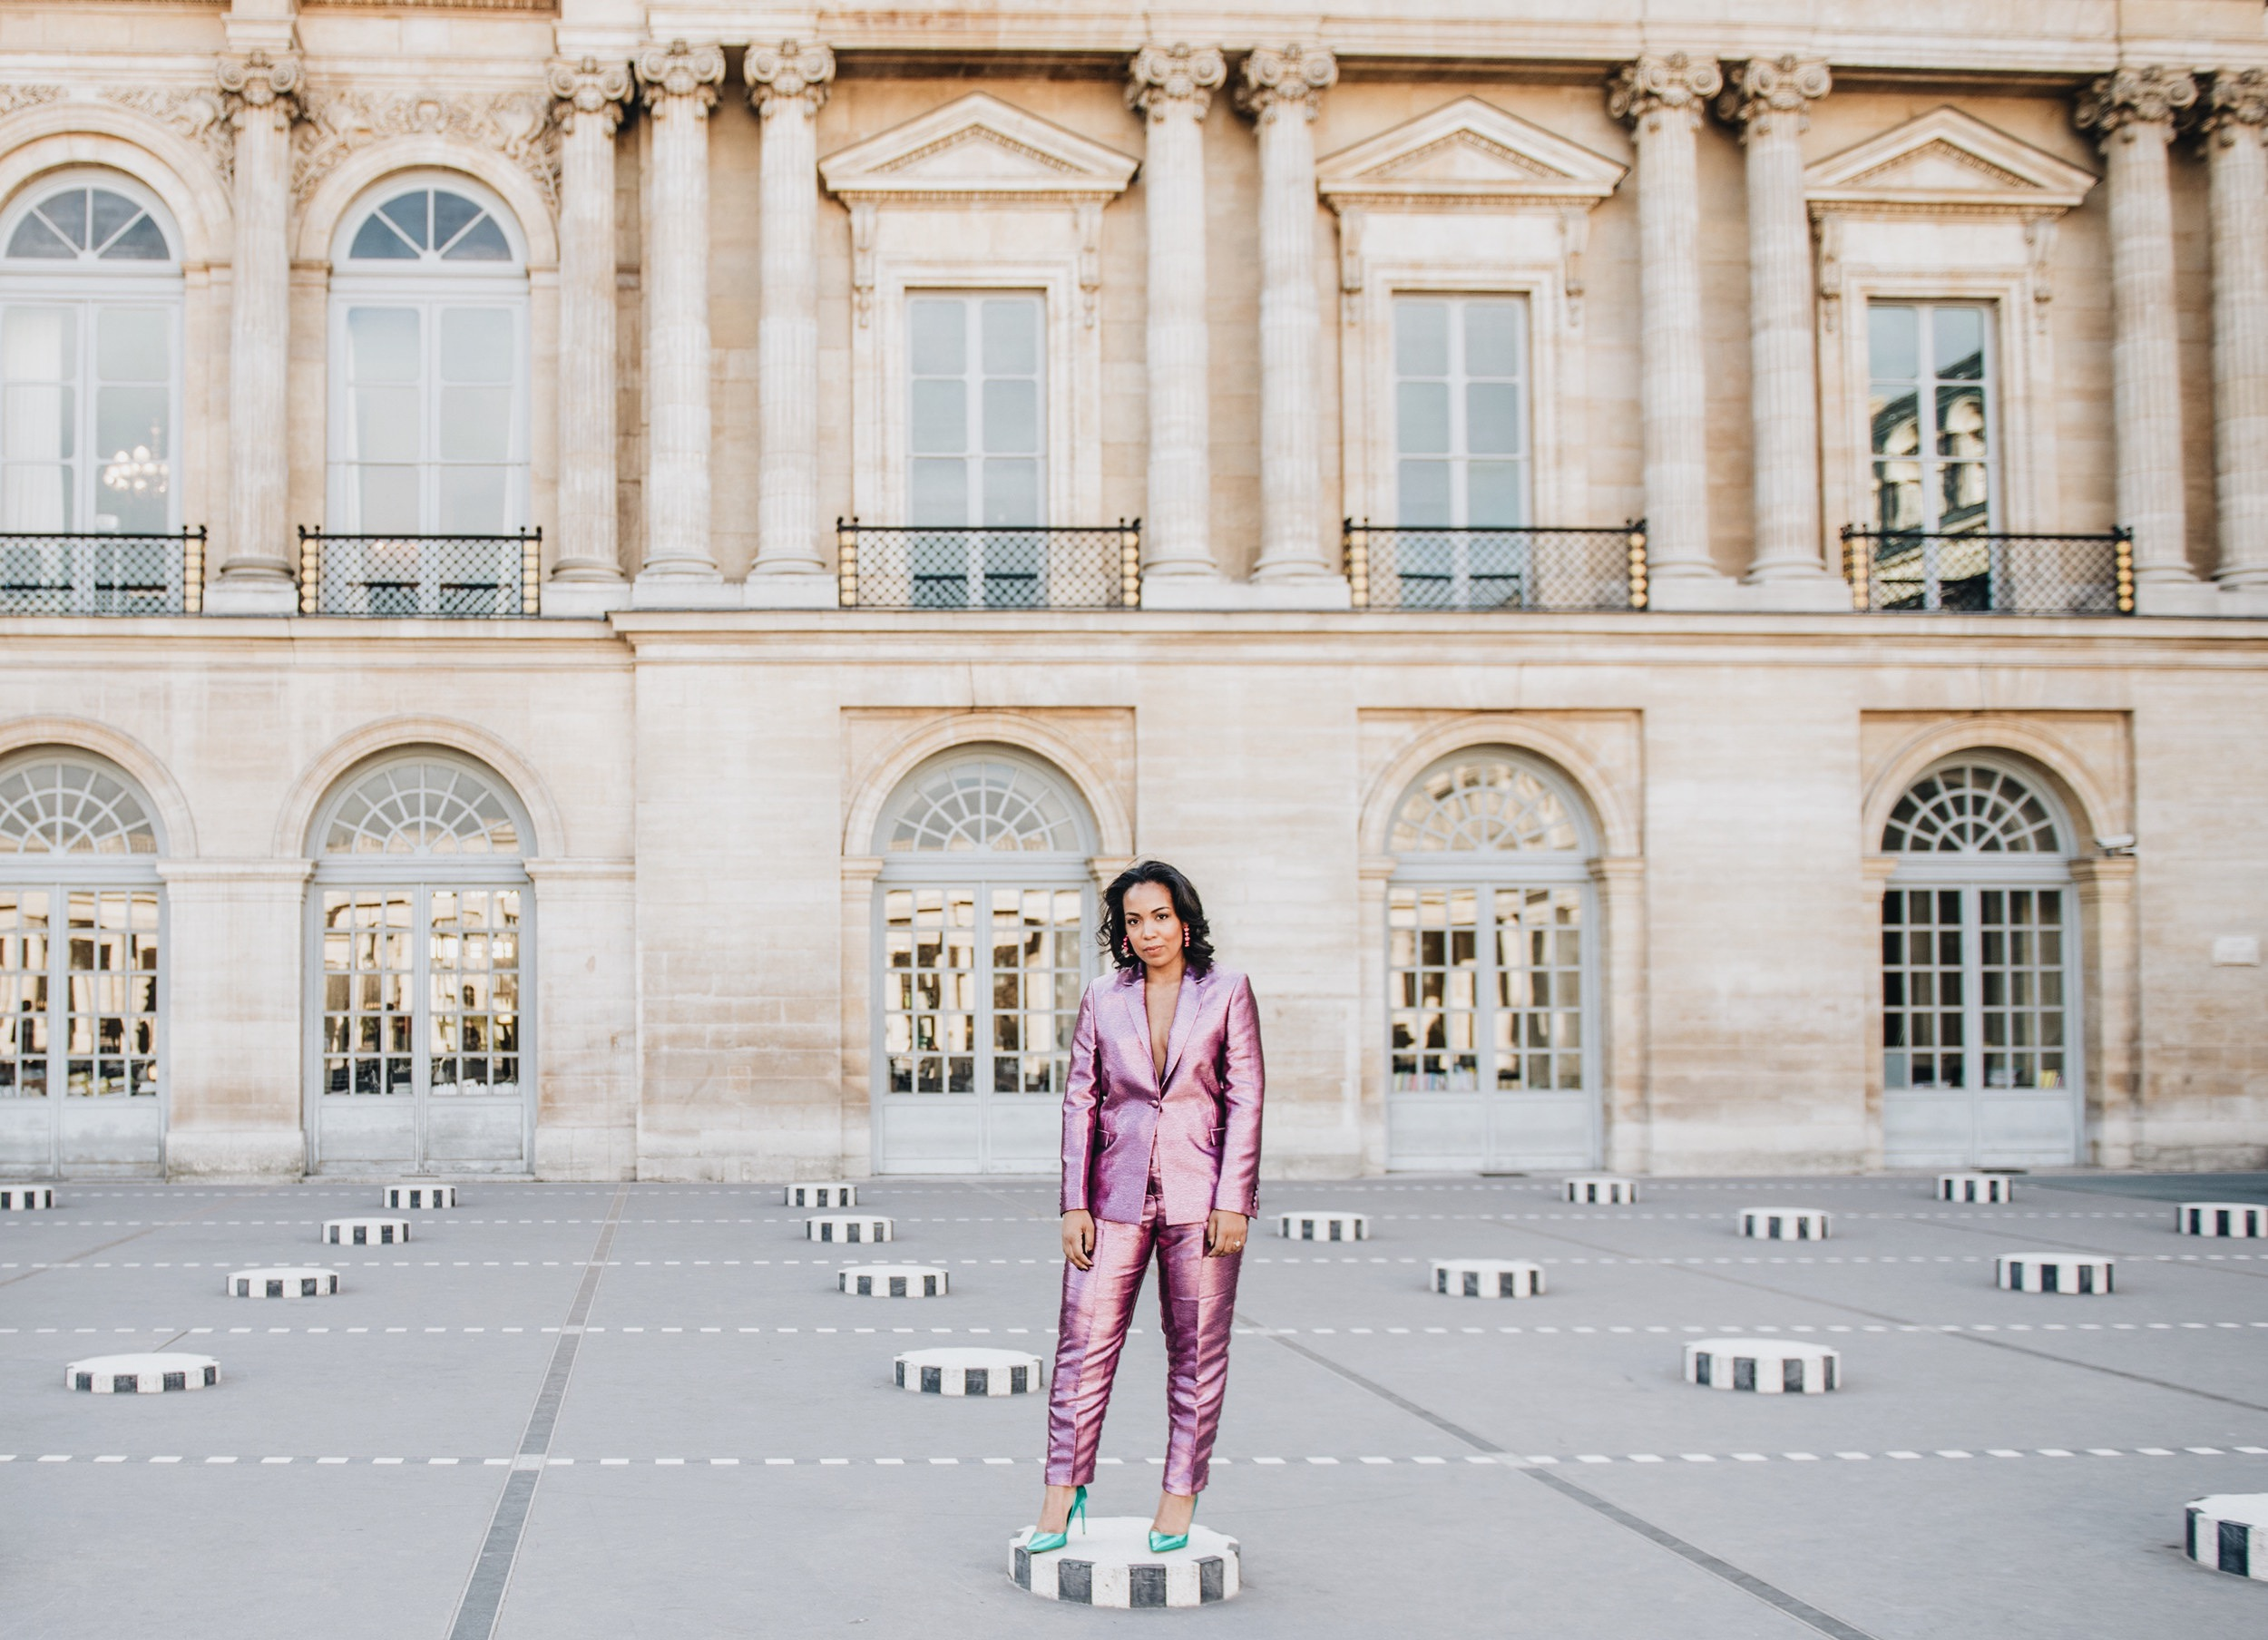 ASOS-Metallic-pink-suit-asos-court-shoe-jcrew-embellished-resin-hoops-mens-wearhouse-navy-suit-9.JPG